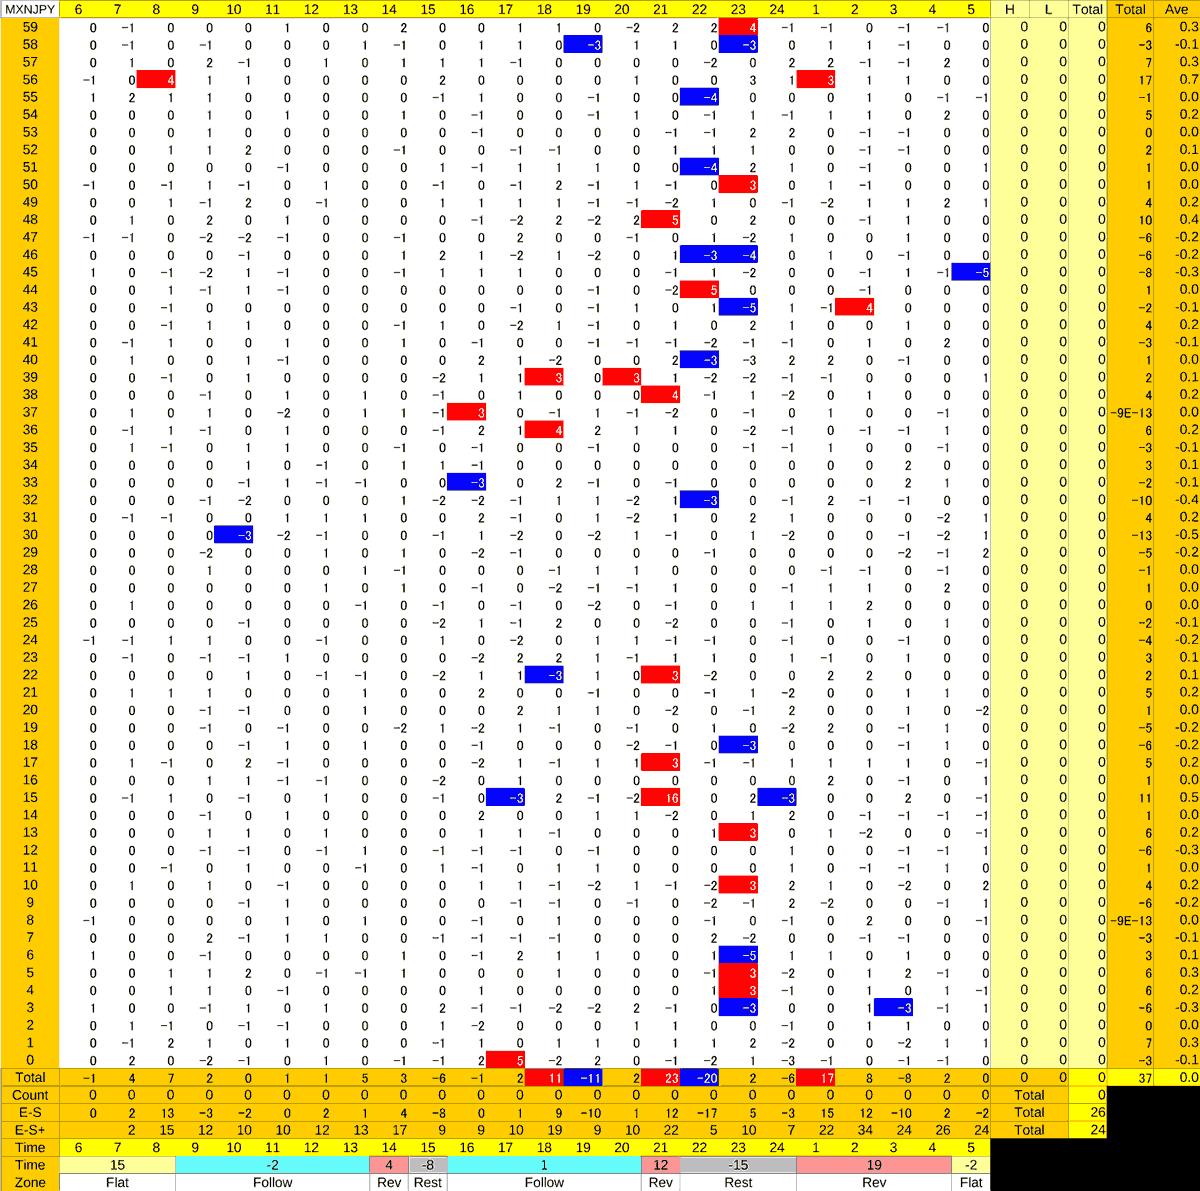 20200902_HS(3)MXNJPY